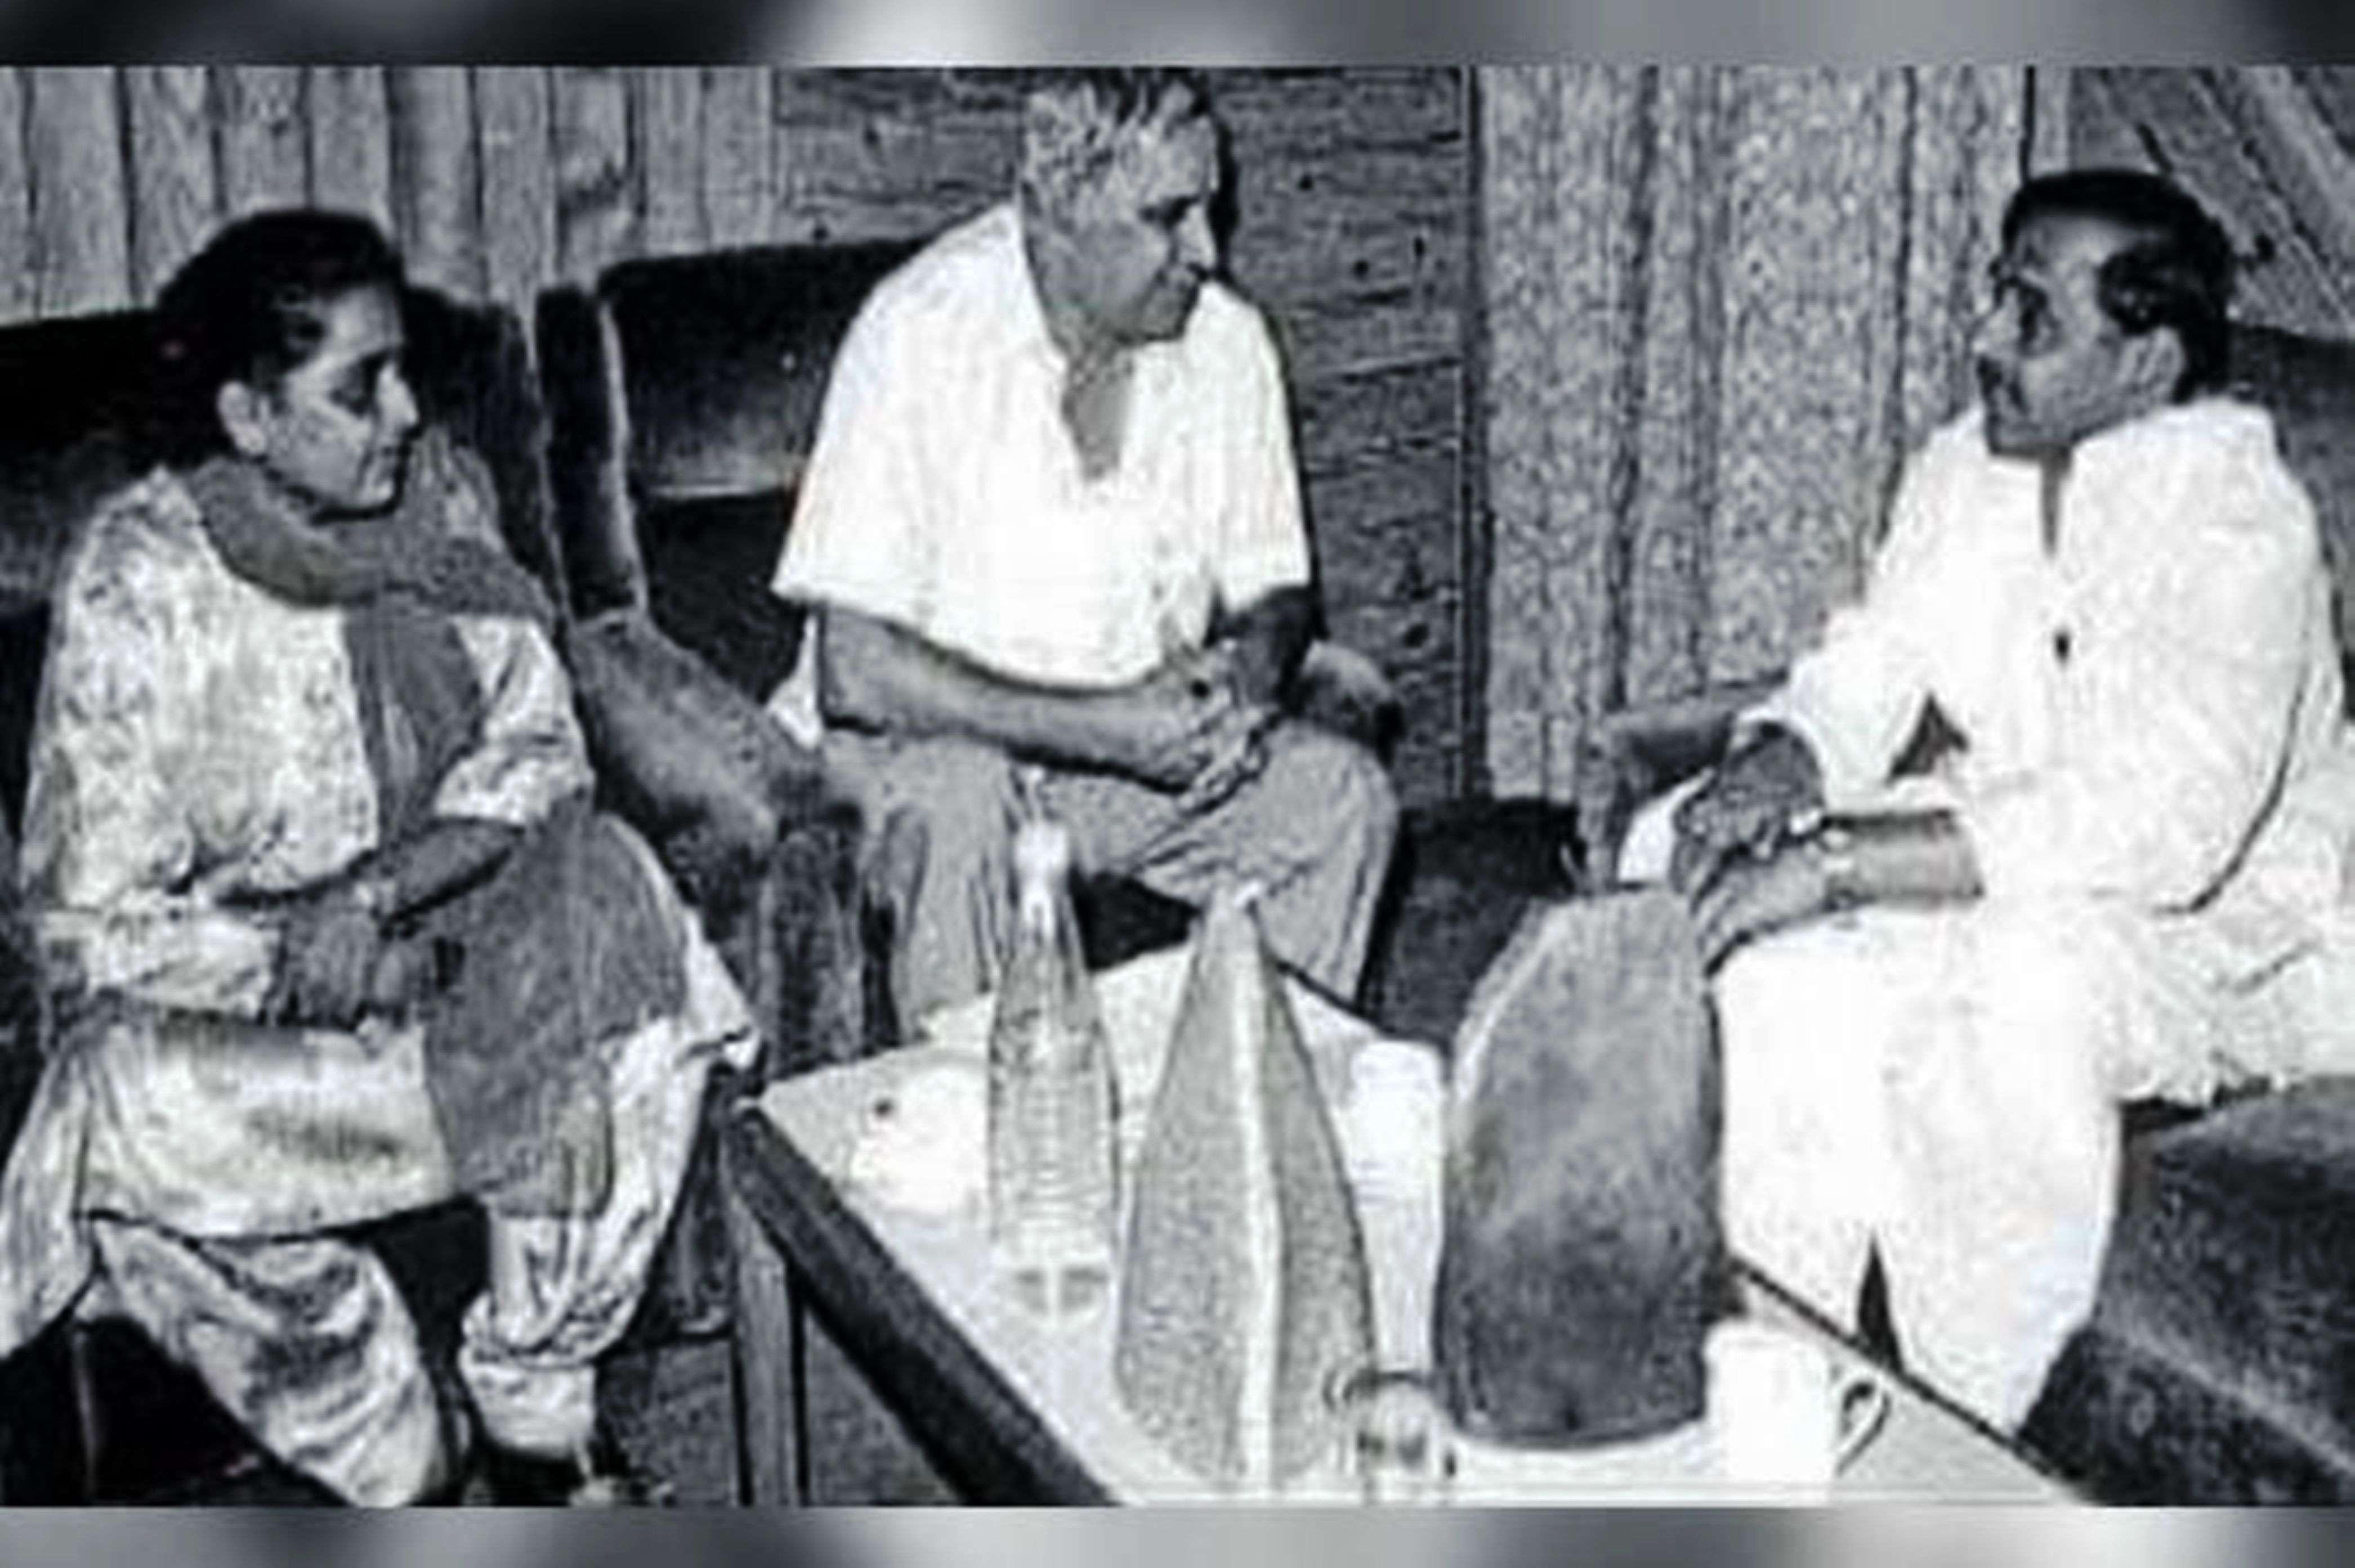 mulayam singh yadav life story in admitted to medanta hospital